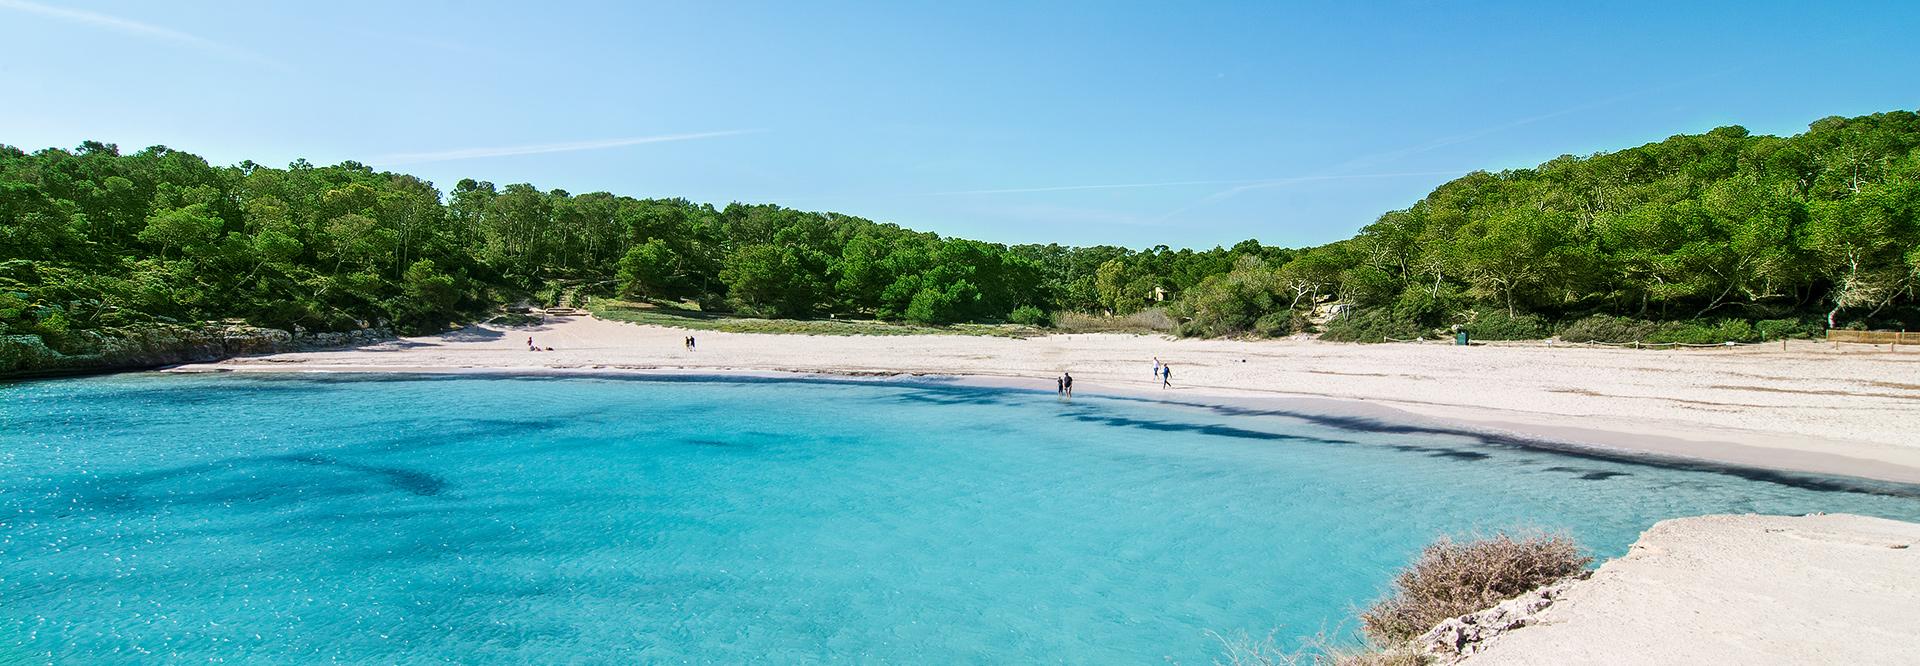 Yoga-Urlaub-Mallorca-s6